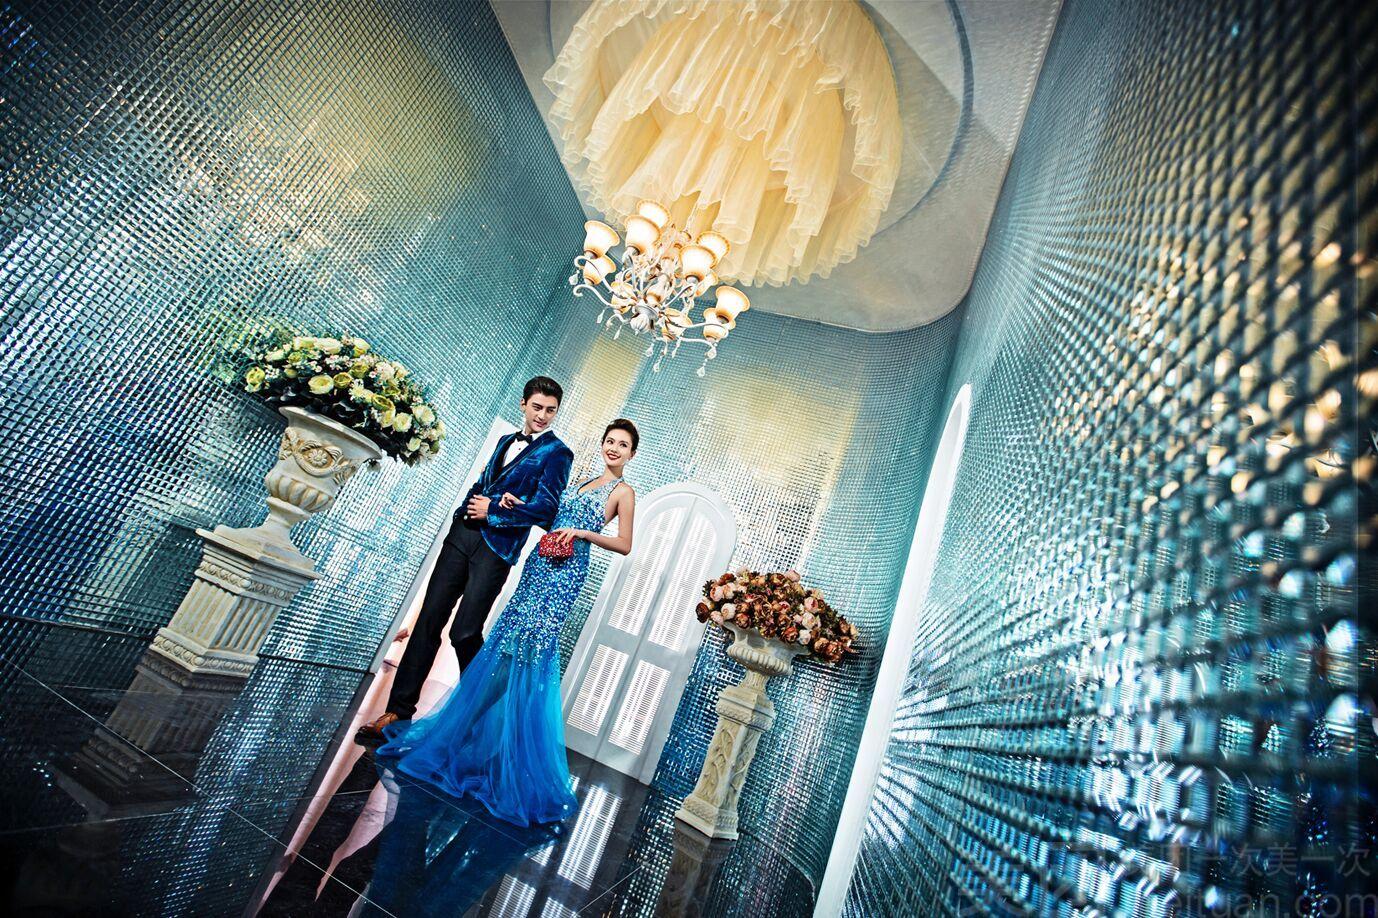 MS慕色高端婚纱摄影-美团